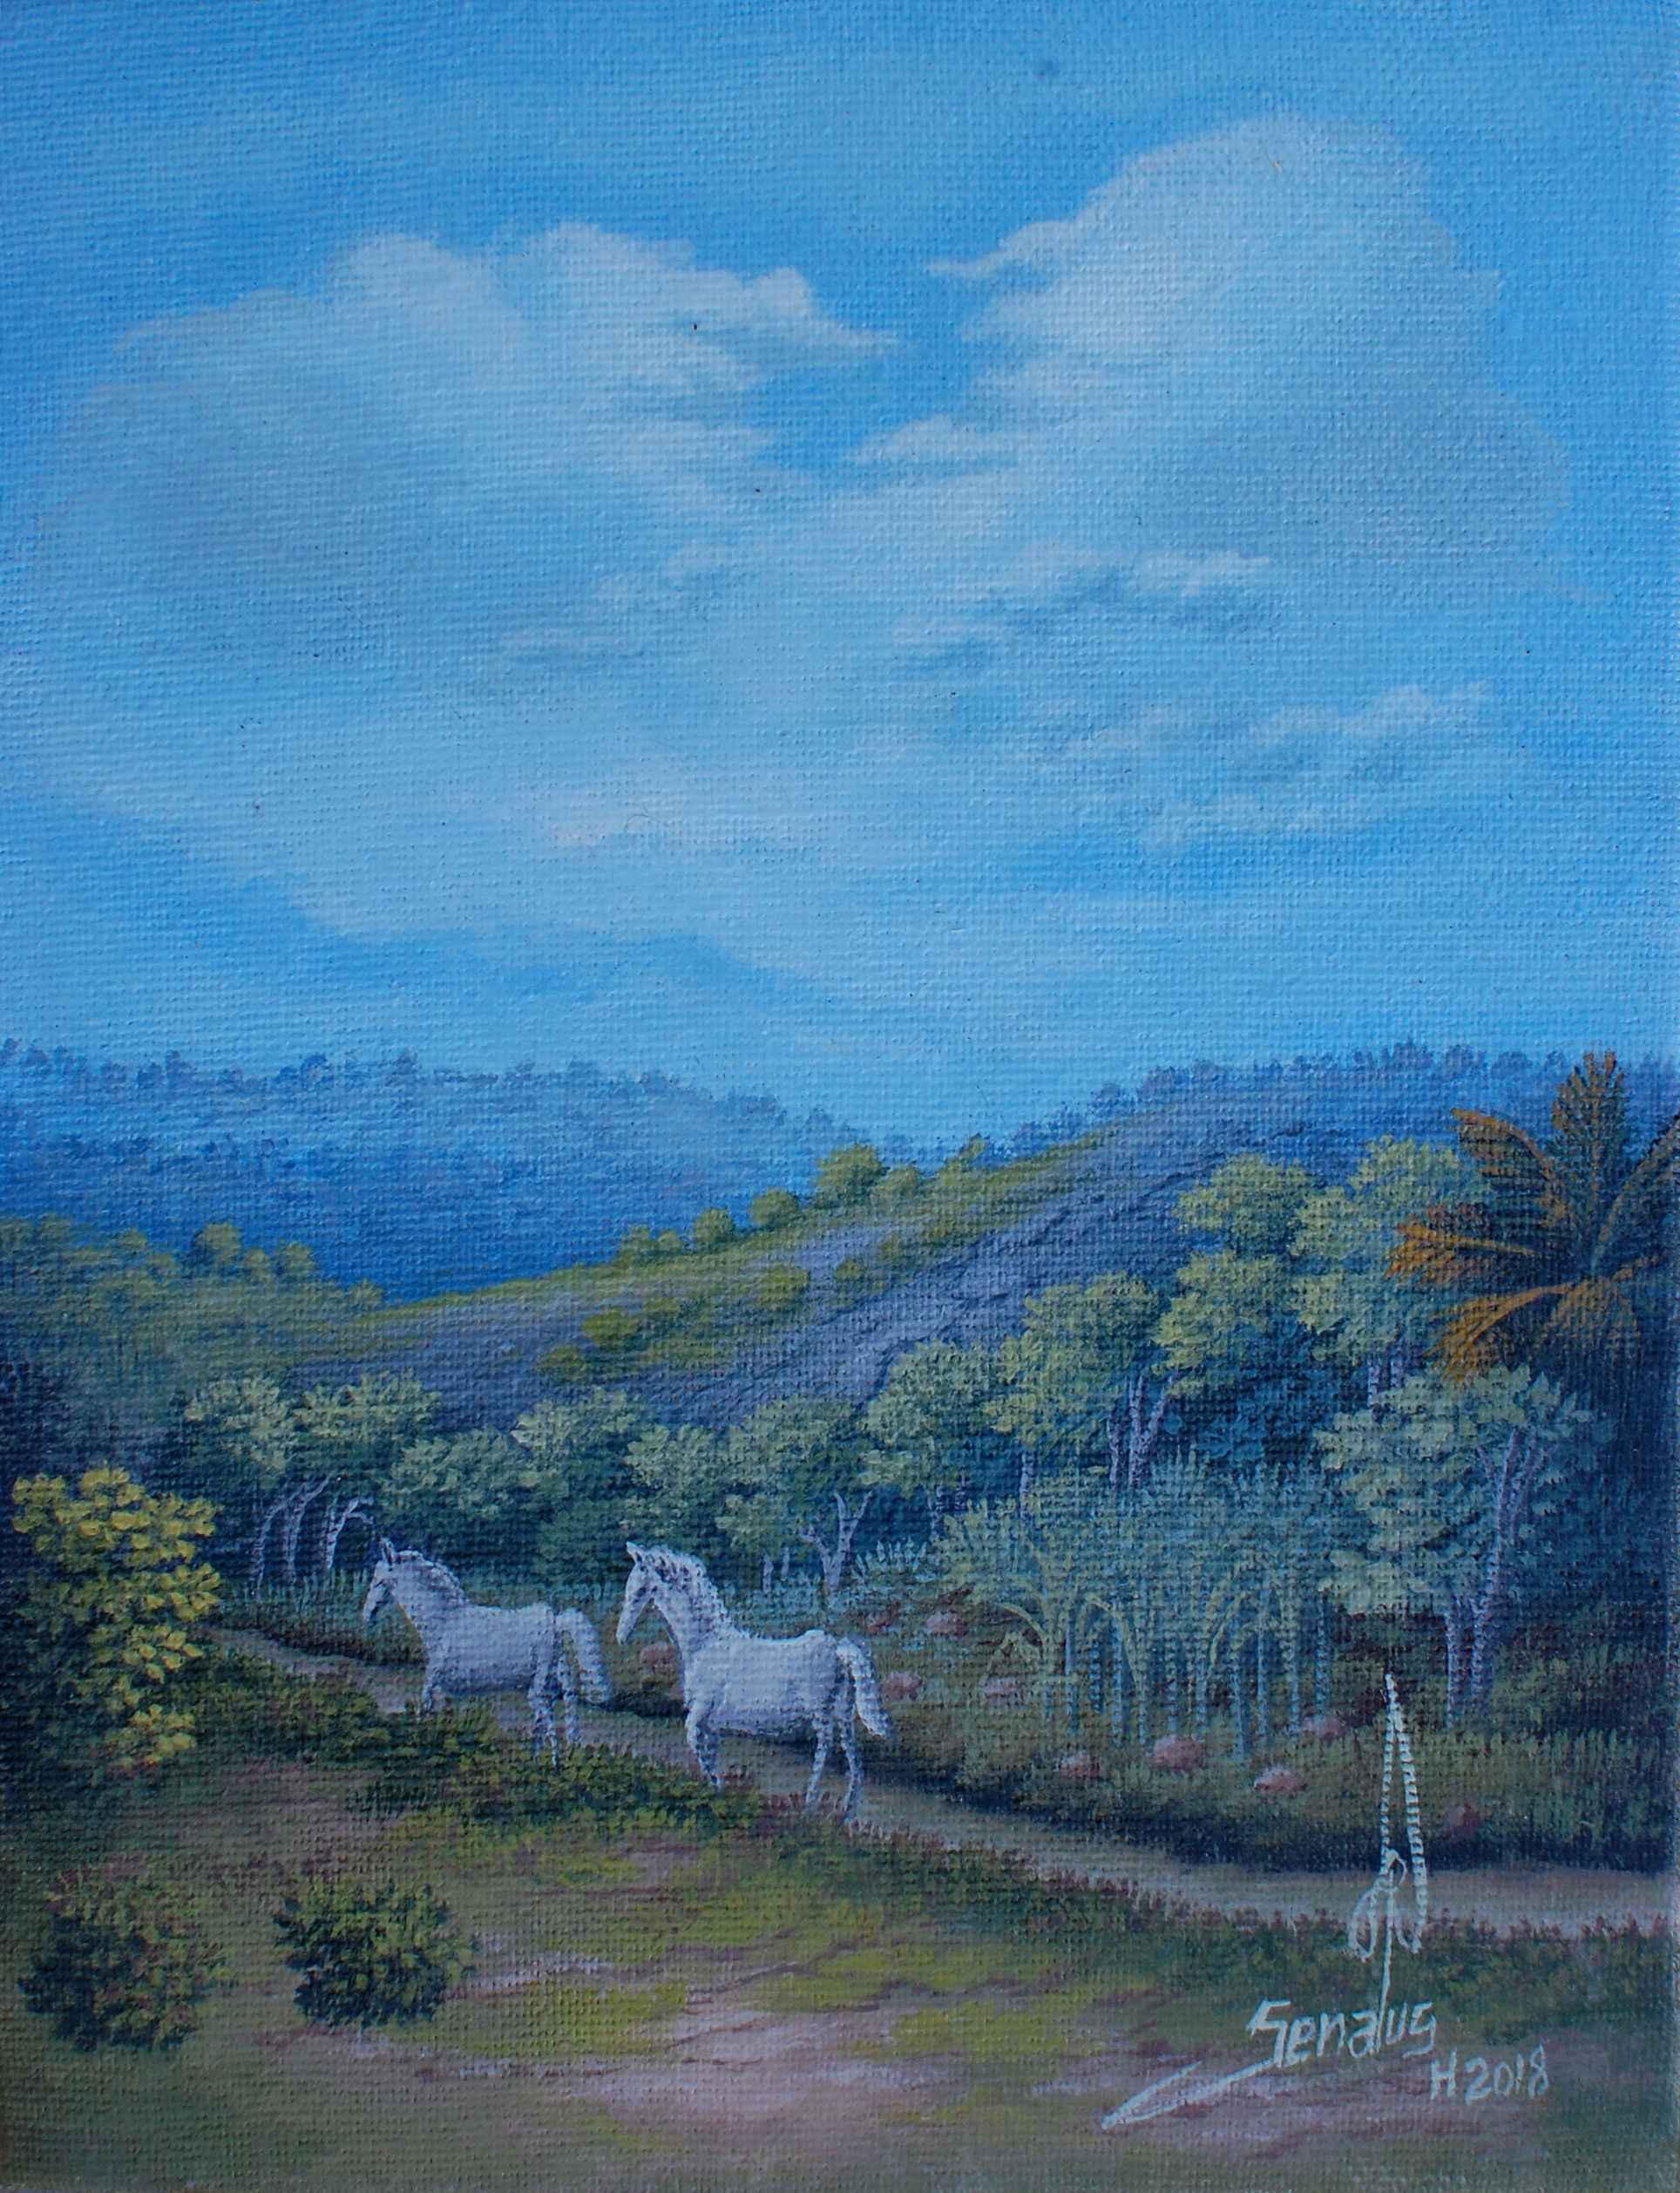 Horses by  Jean-Louis SENATUS - Masterpiece Online